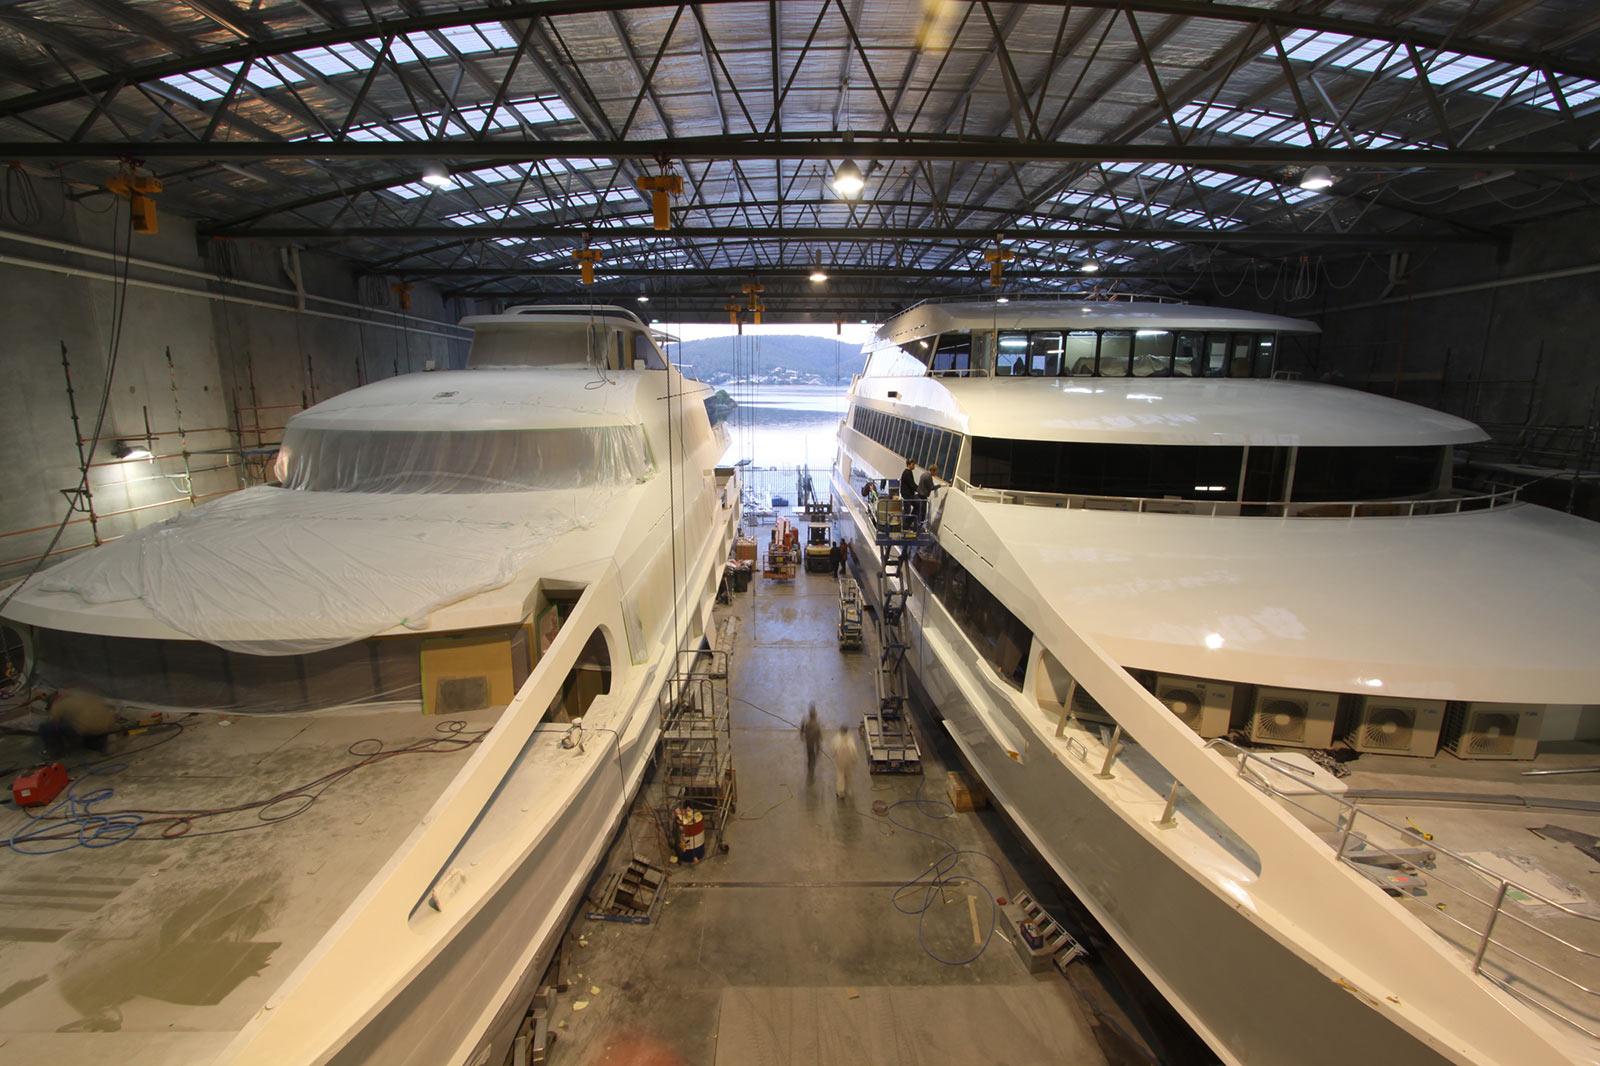 Maritime capabilities photo